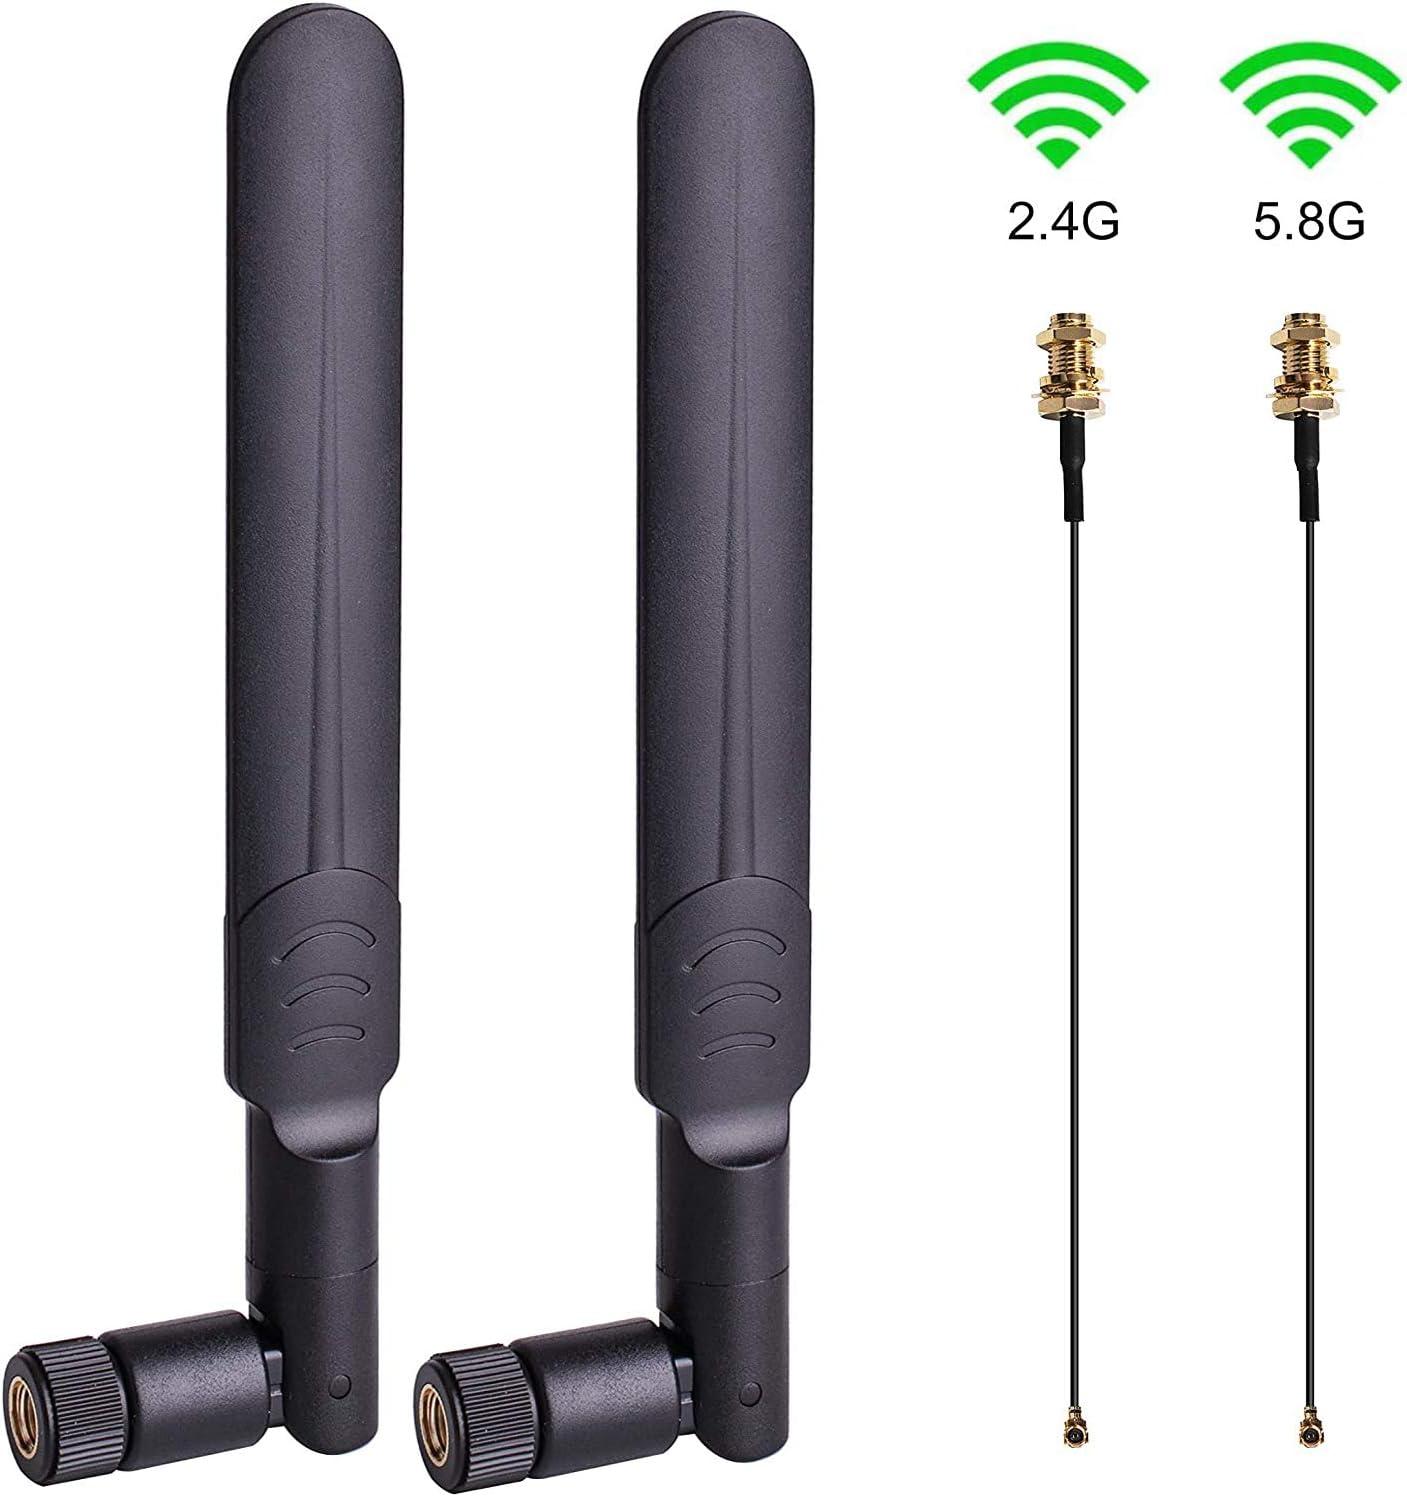 2 x Dual Band WiFi 6dBi Antenna RP-SMA 2.4Ghz 5Ghz